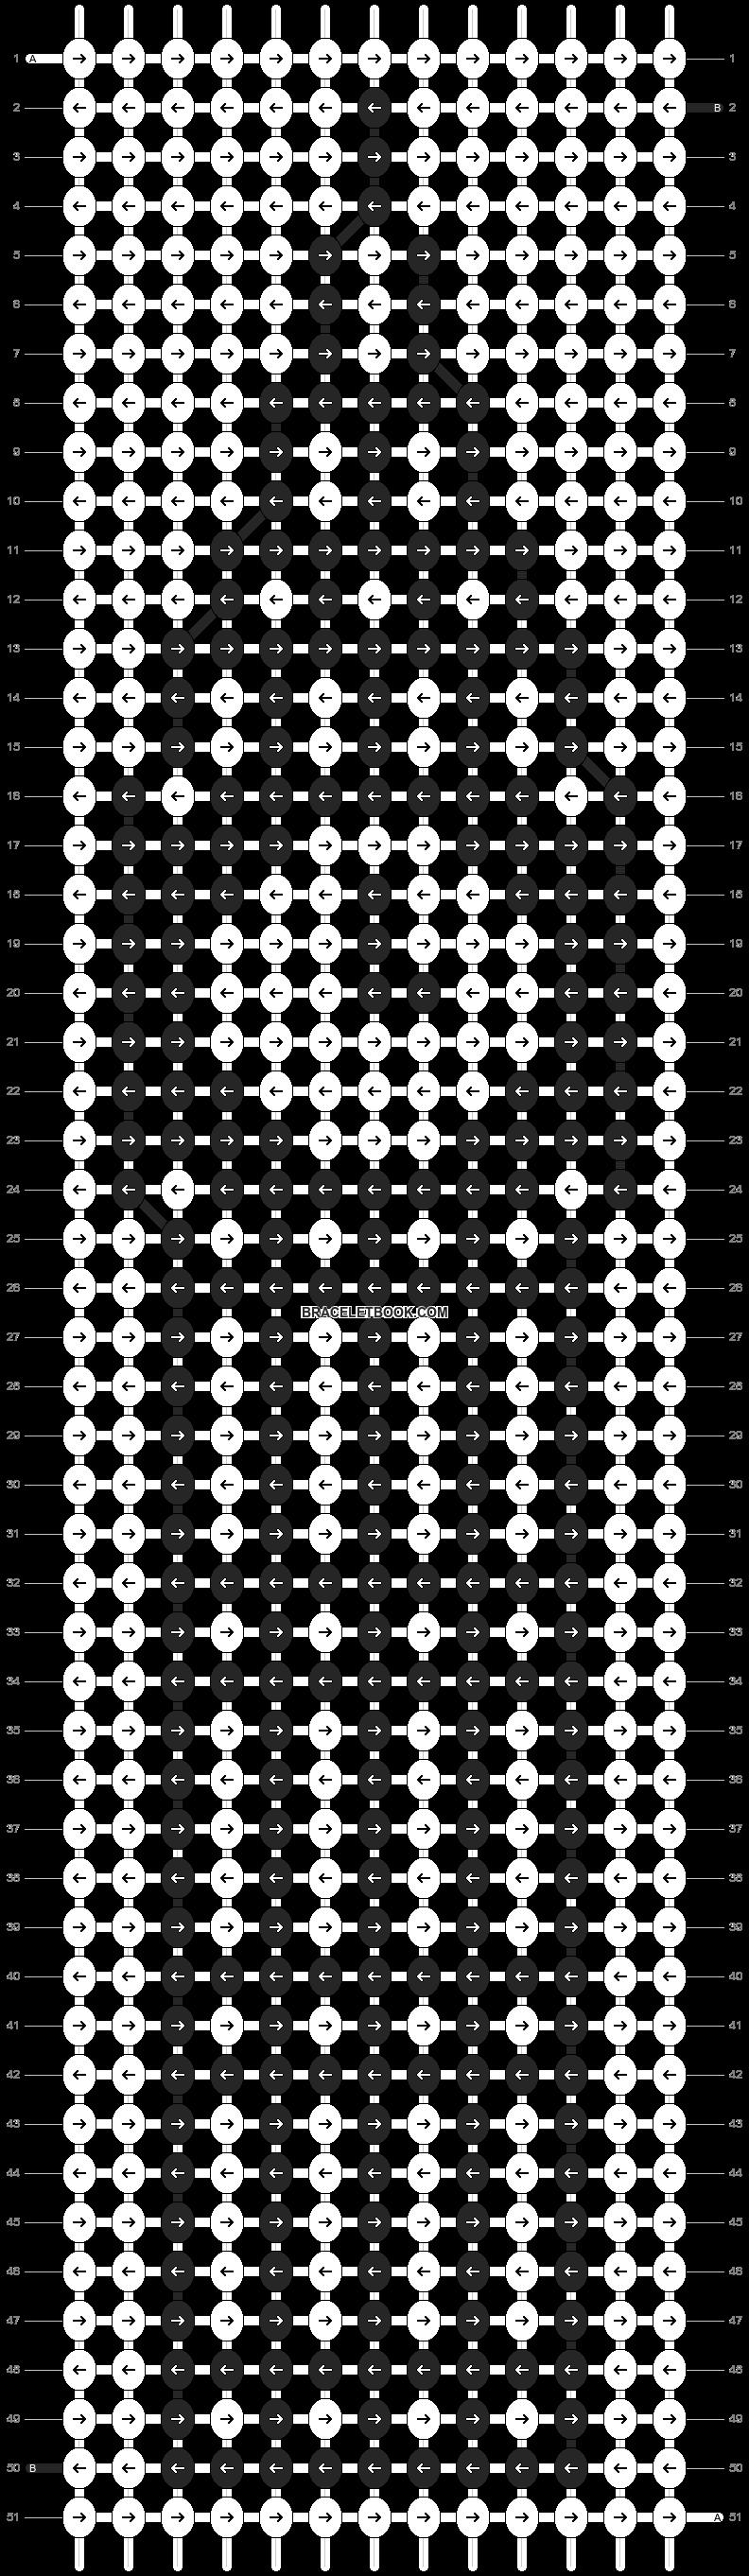 Alpha pattern #12366 pattern